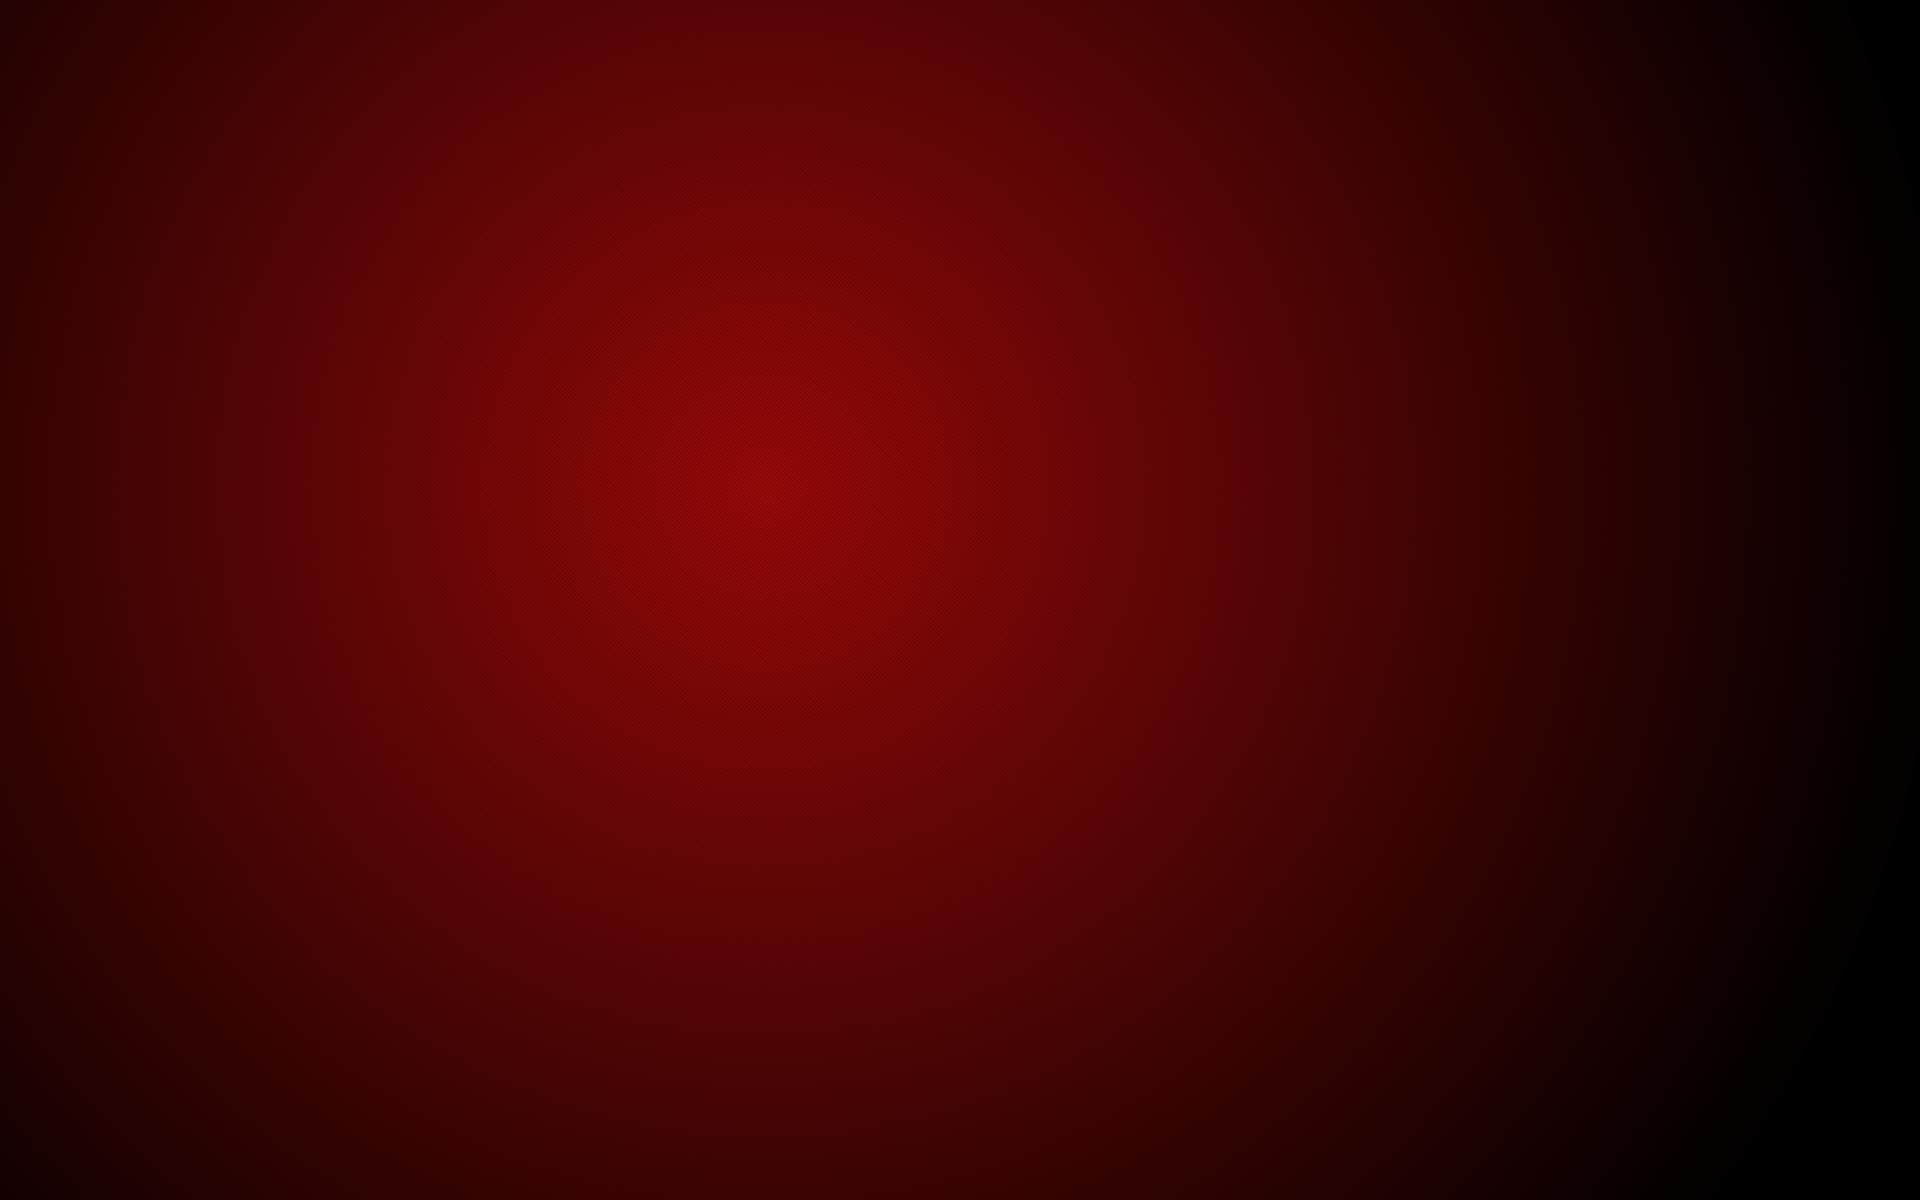 Plain Red Background – phebus